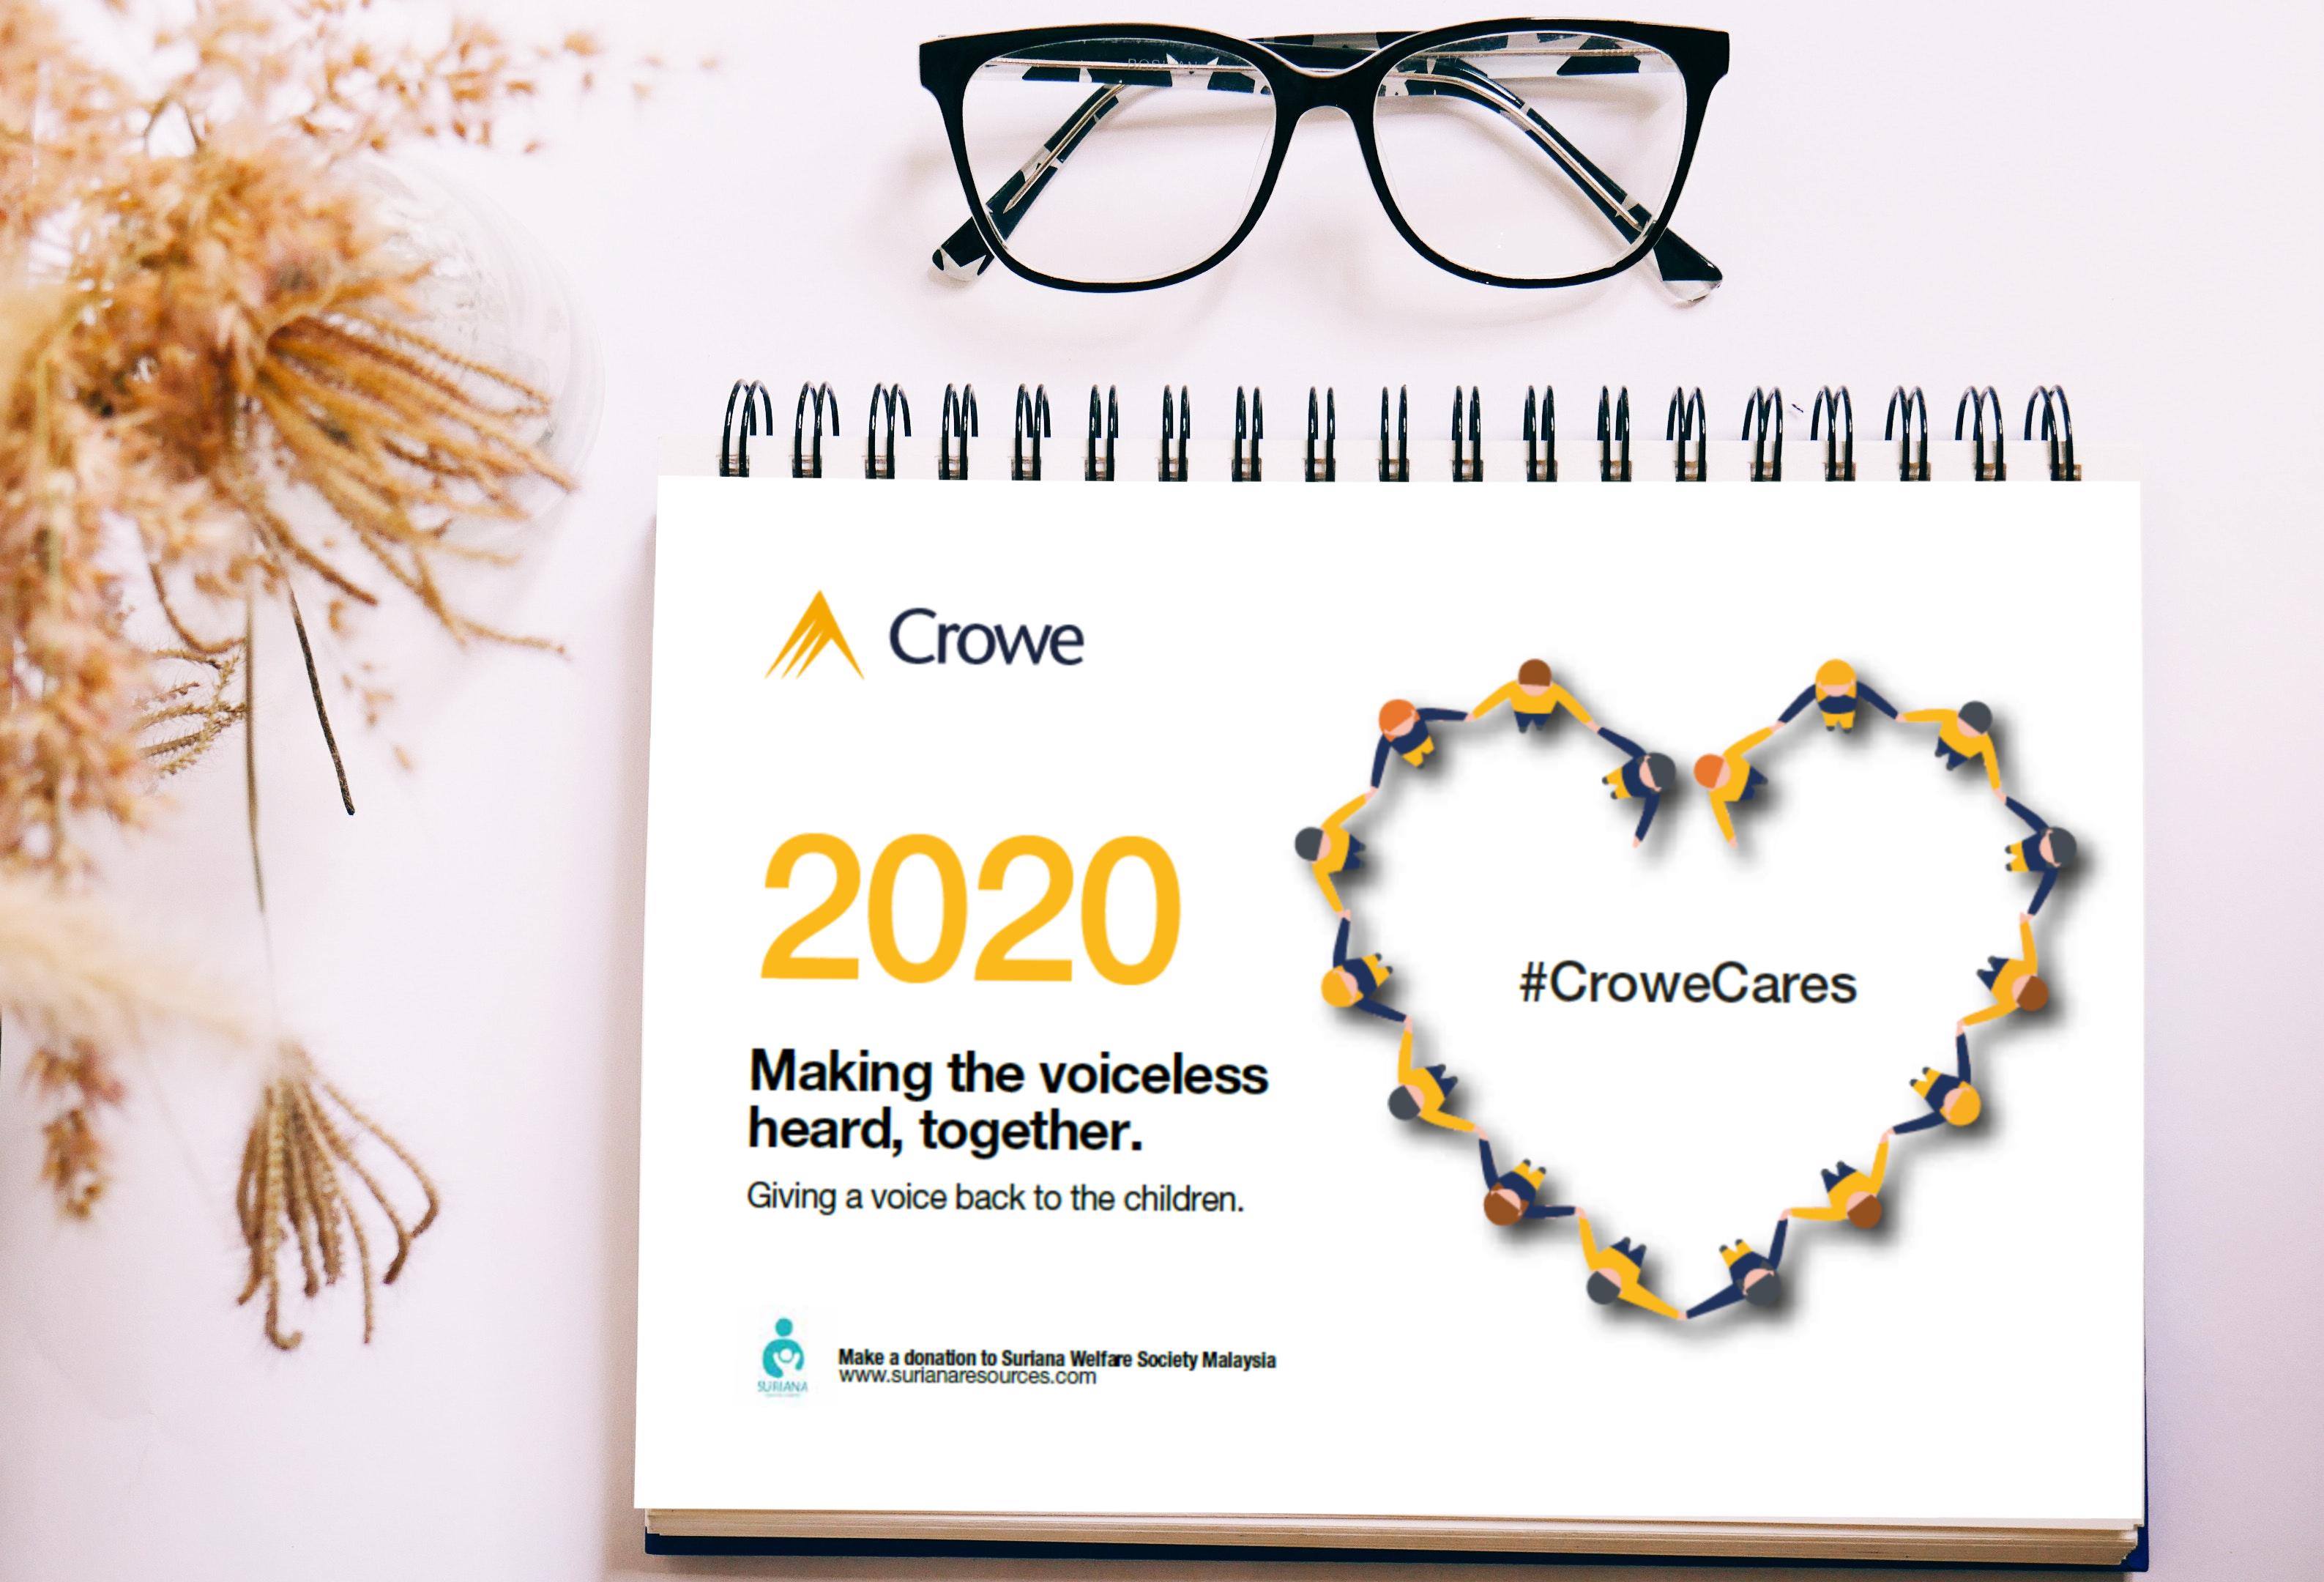 Crowe Malaysia Suriana Welfare Society, Calendar 2020